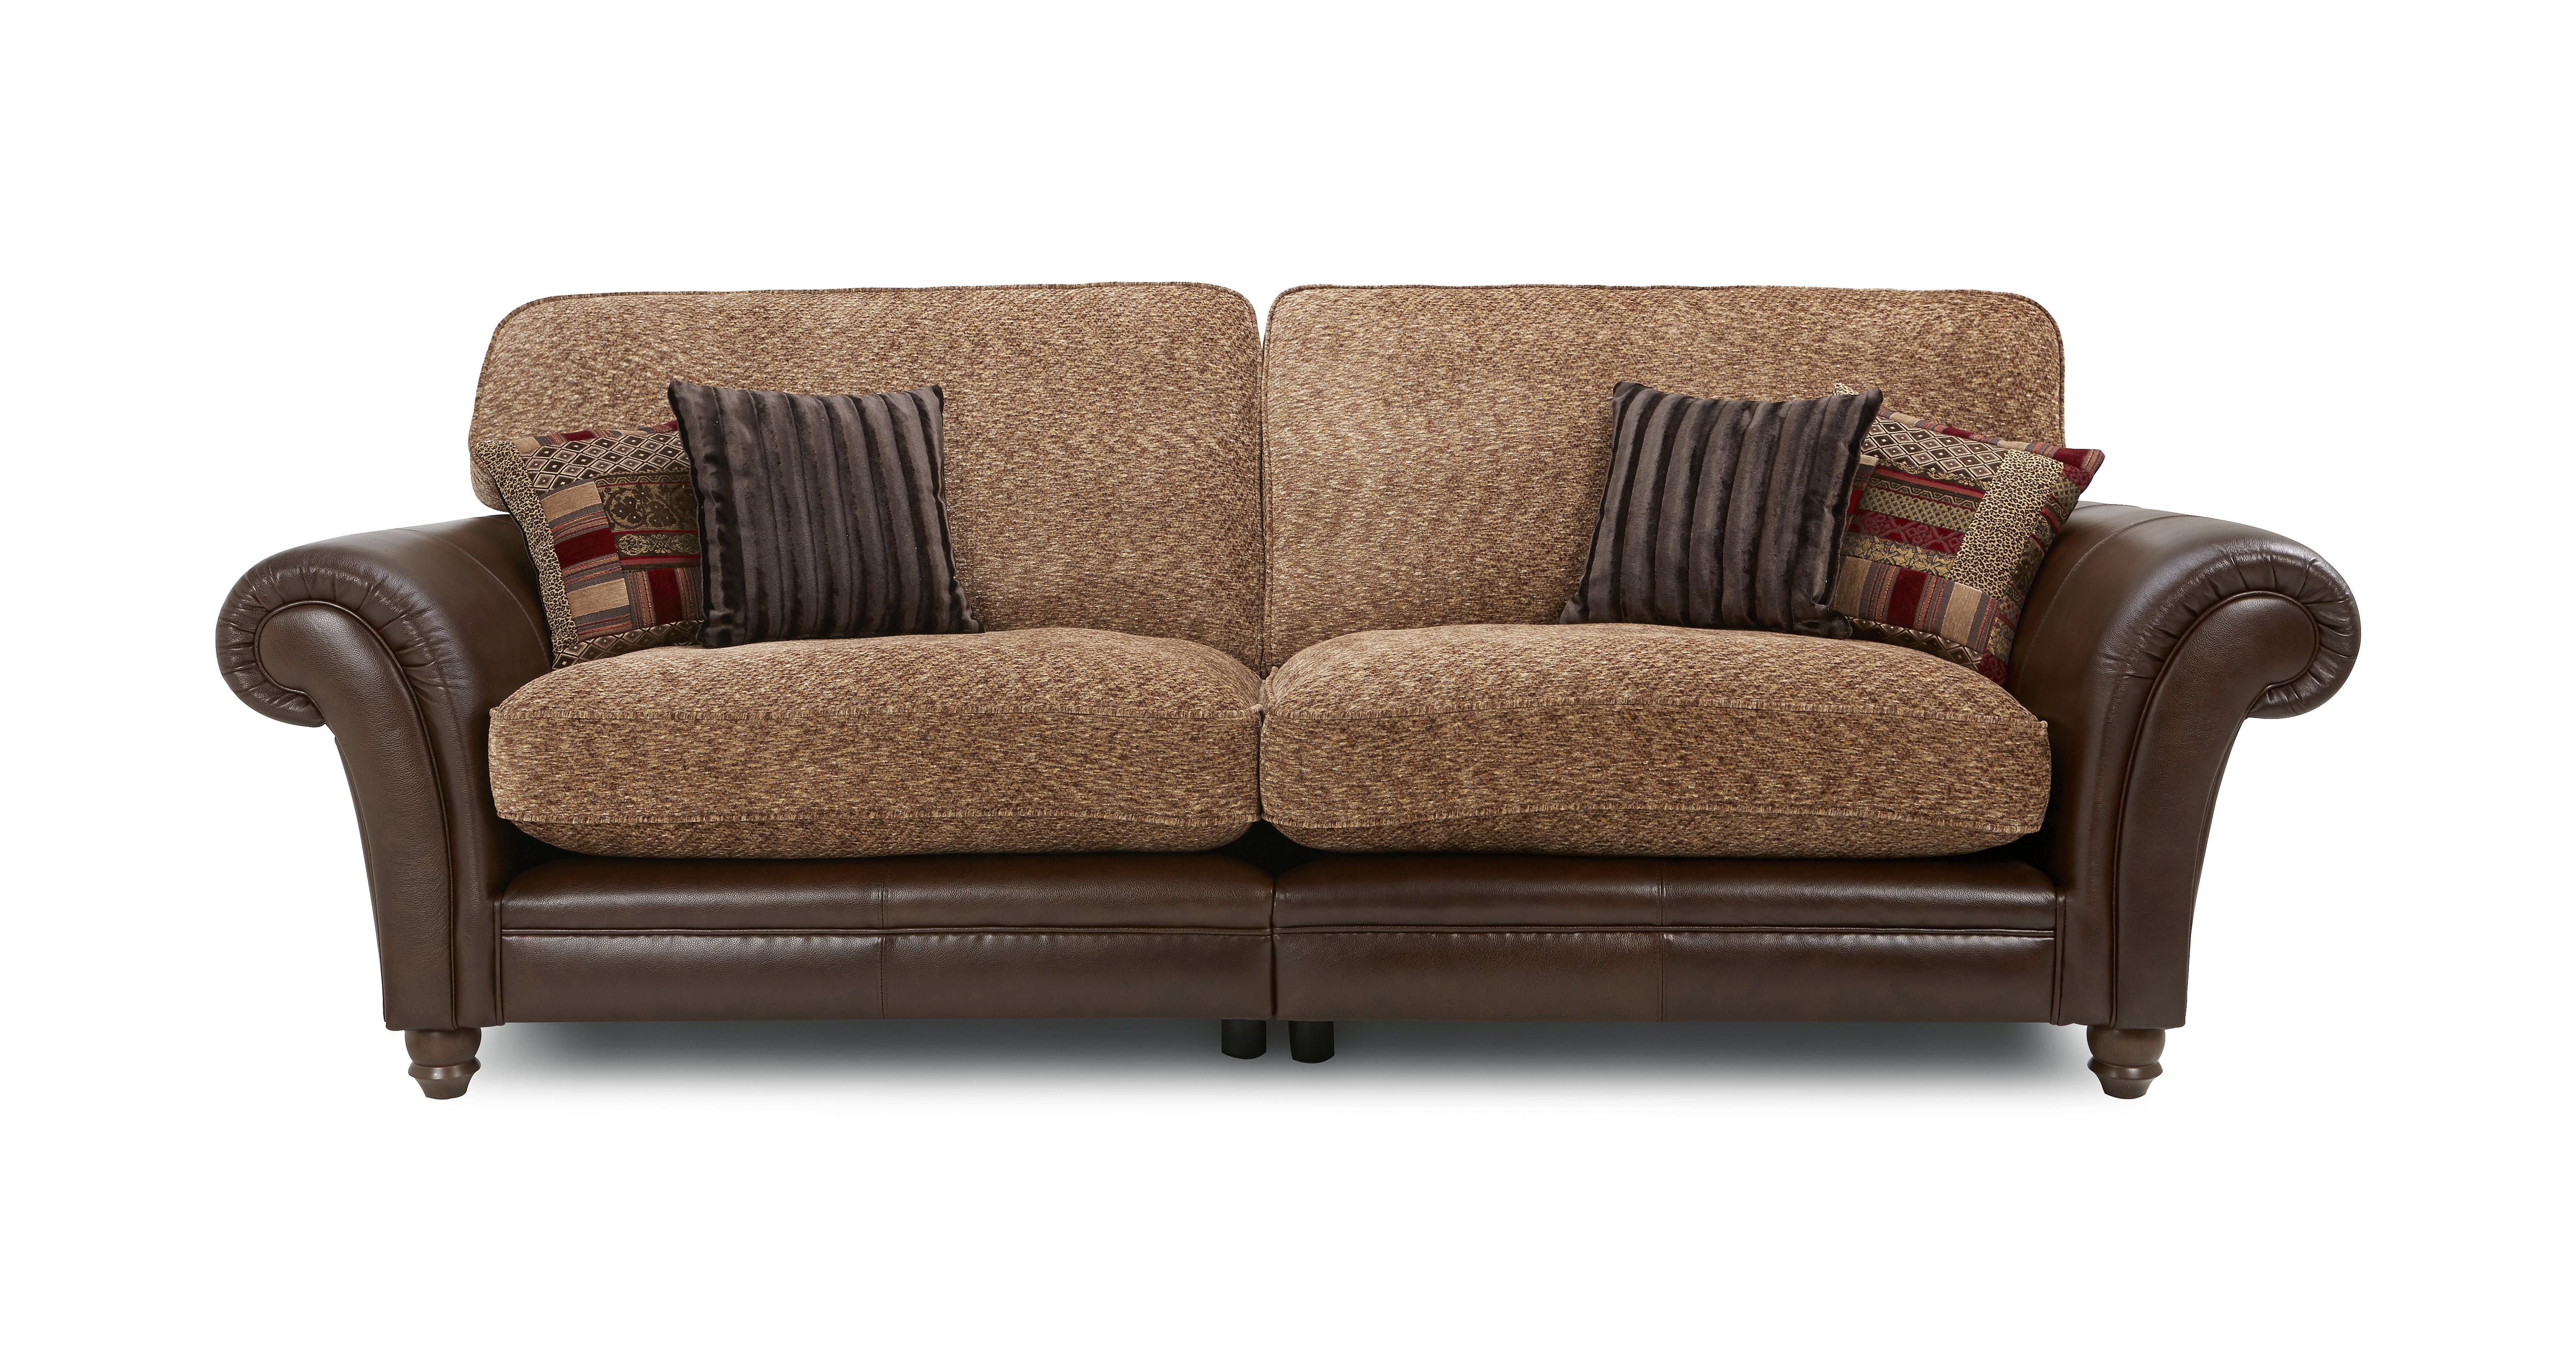 Santiago 3 Seater Formal Back Sofa